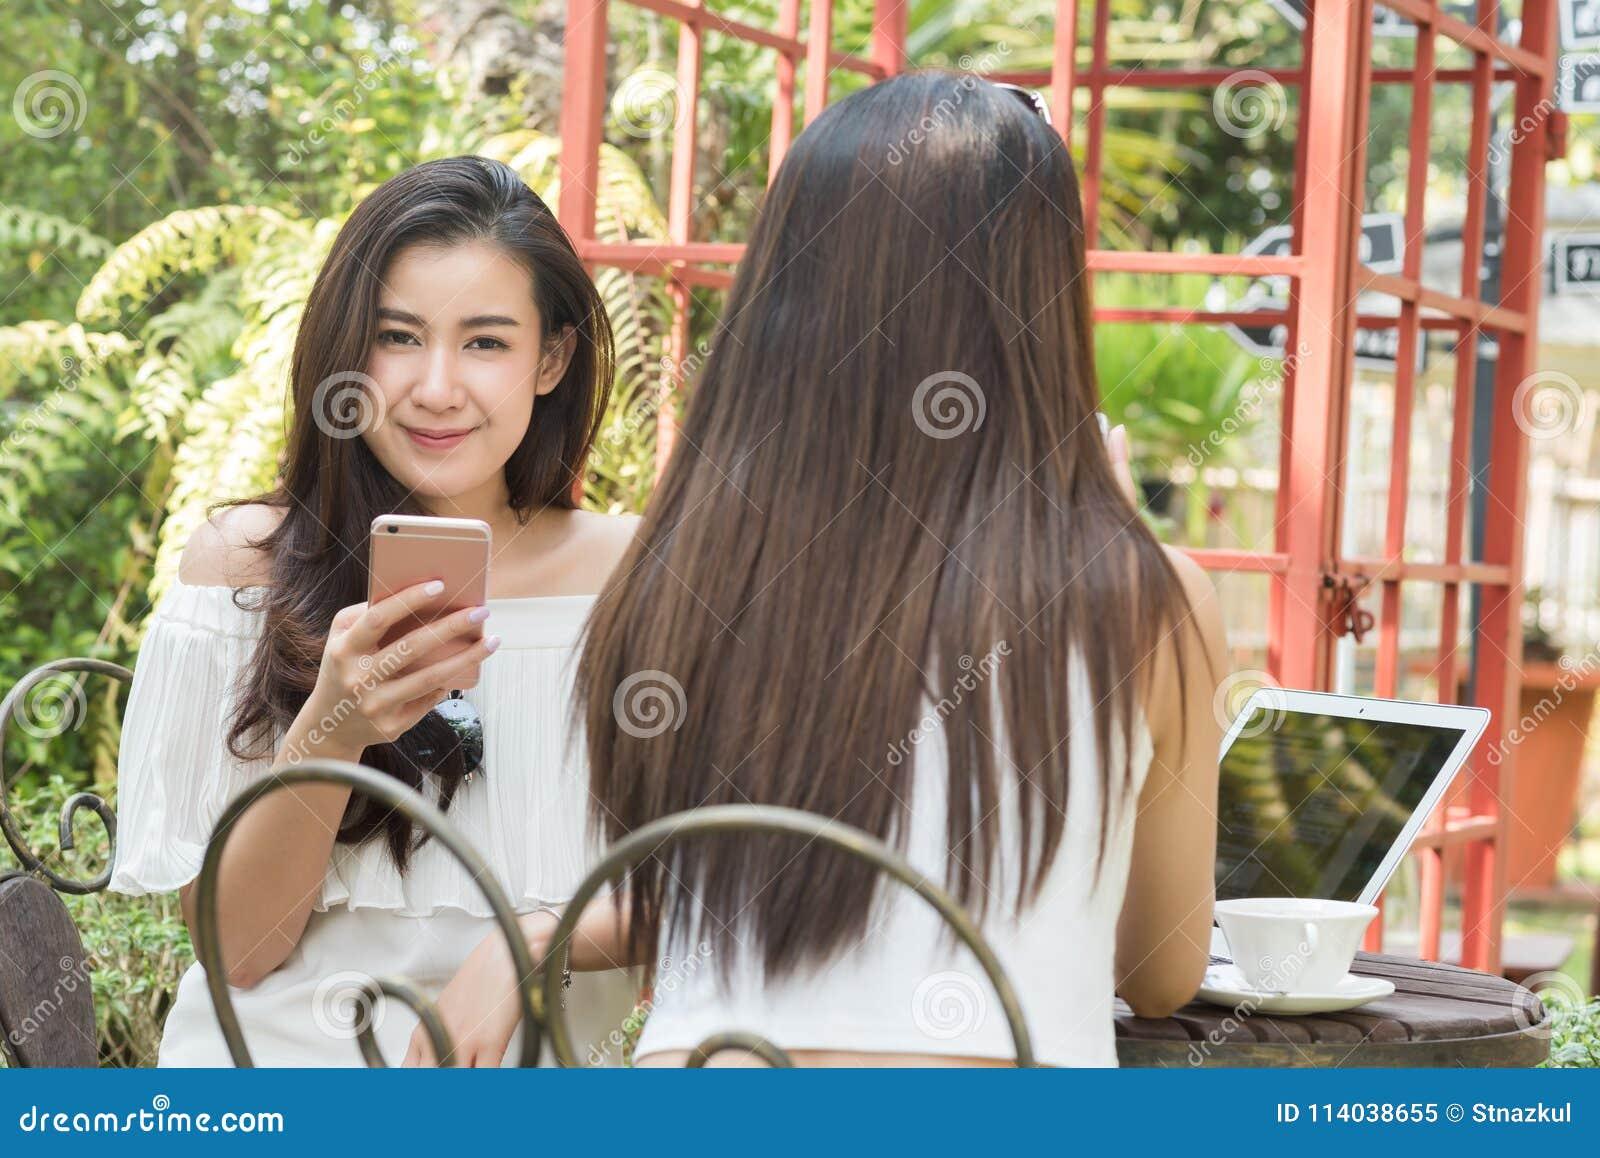 tinder dallas inter racial dating